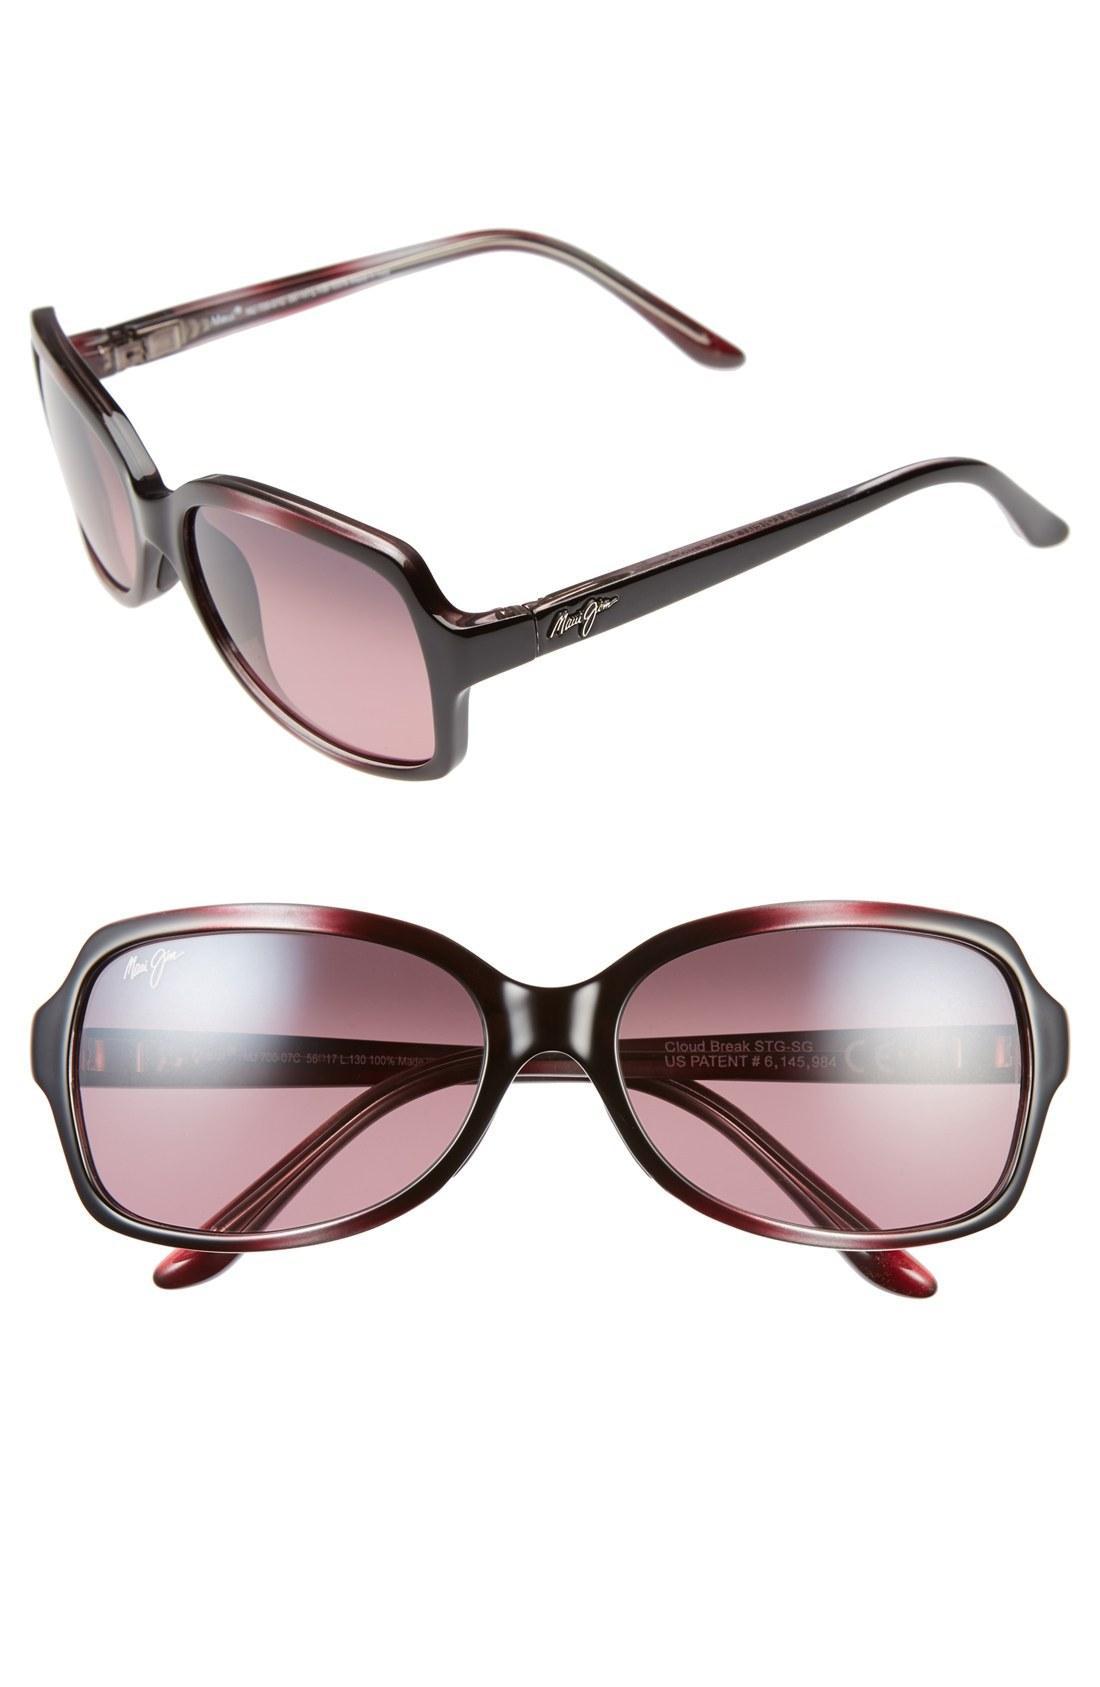 3d34f98cab5e Style Name: Maui Jim Cloud Break 56Mm Polarizedplus2 Sunglasses. Style  Number: 1027790.